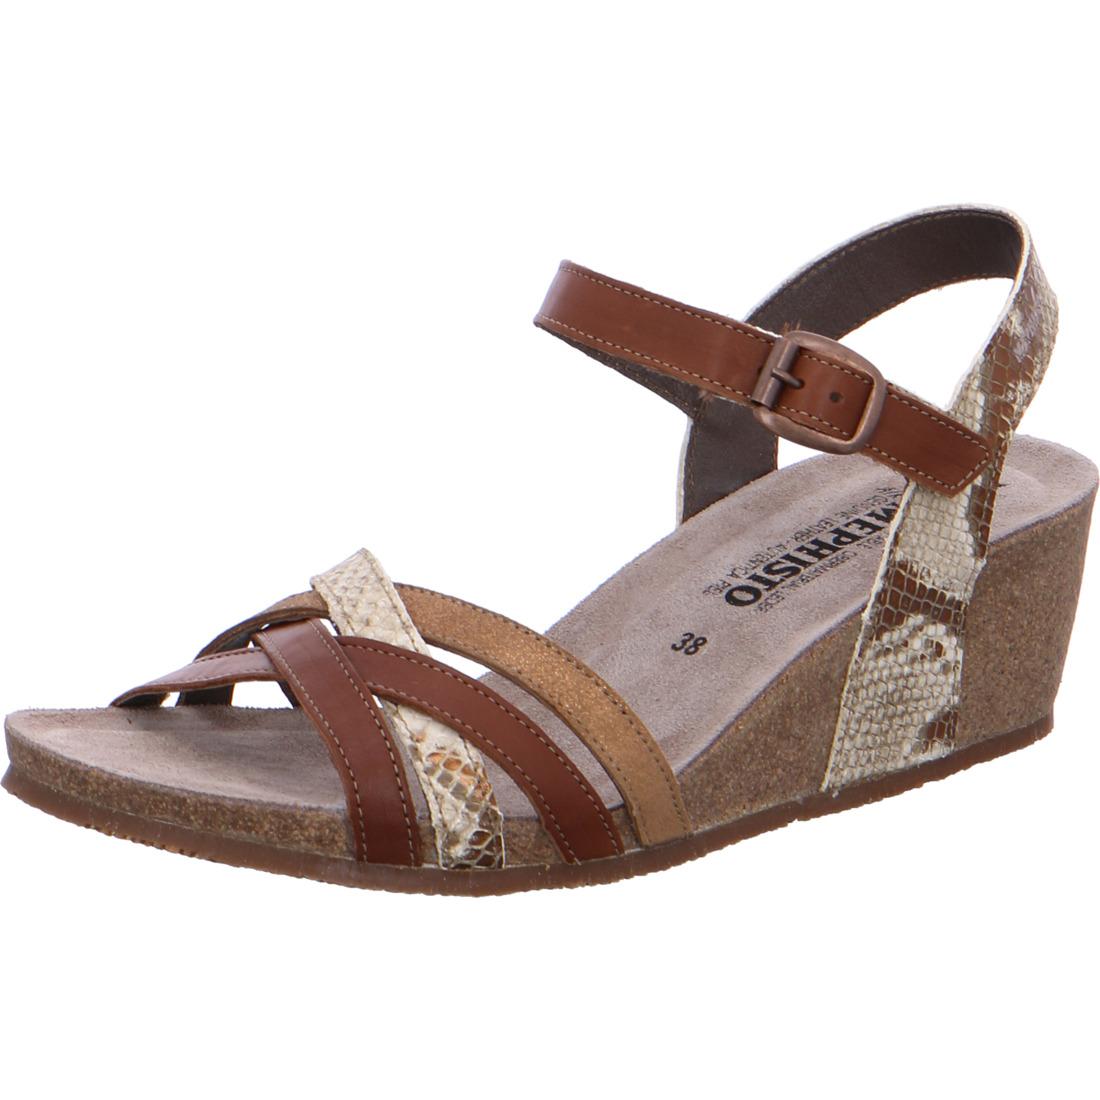 mephisto damen sandale mado sandaletten damen mephisto shop. Black Bedroom Furniture Sets. Home Design Ideas